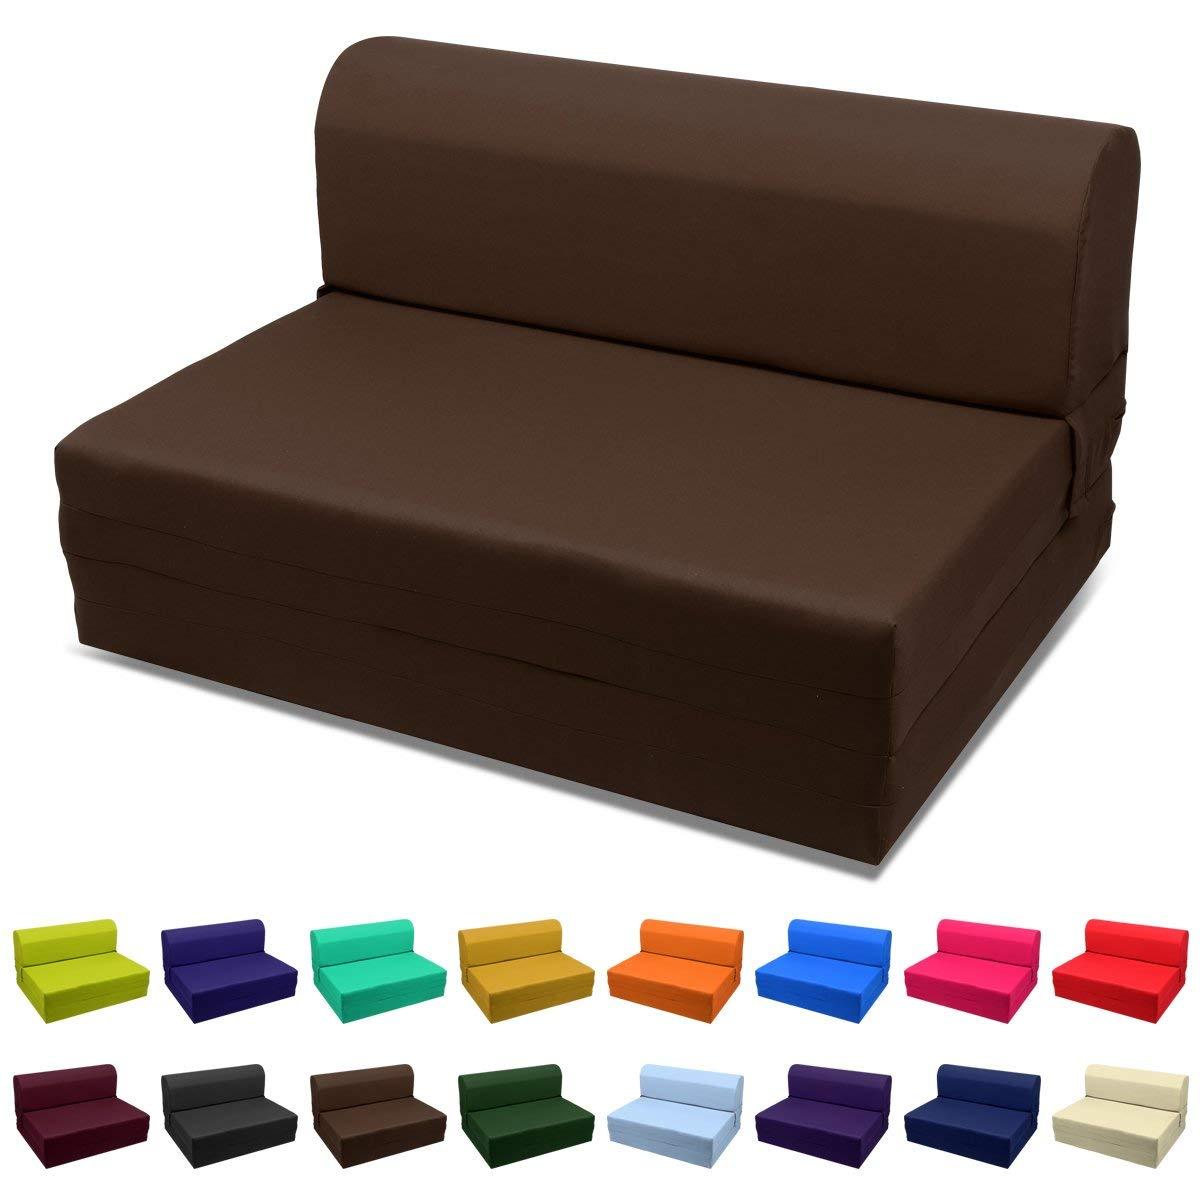 Full-size folding mattress amazon.com: Armchair folding foam bed choose color U0026-size single, twin ROSSRXN